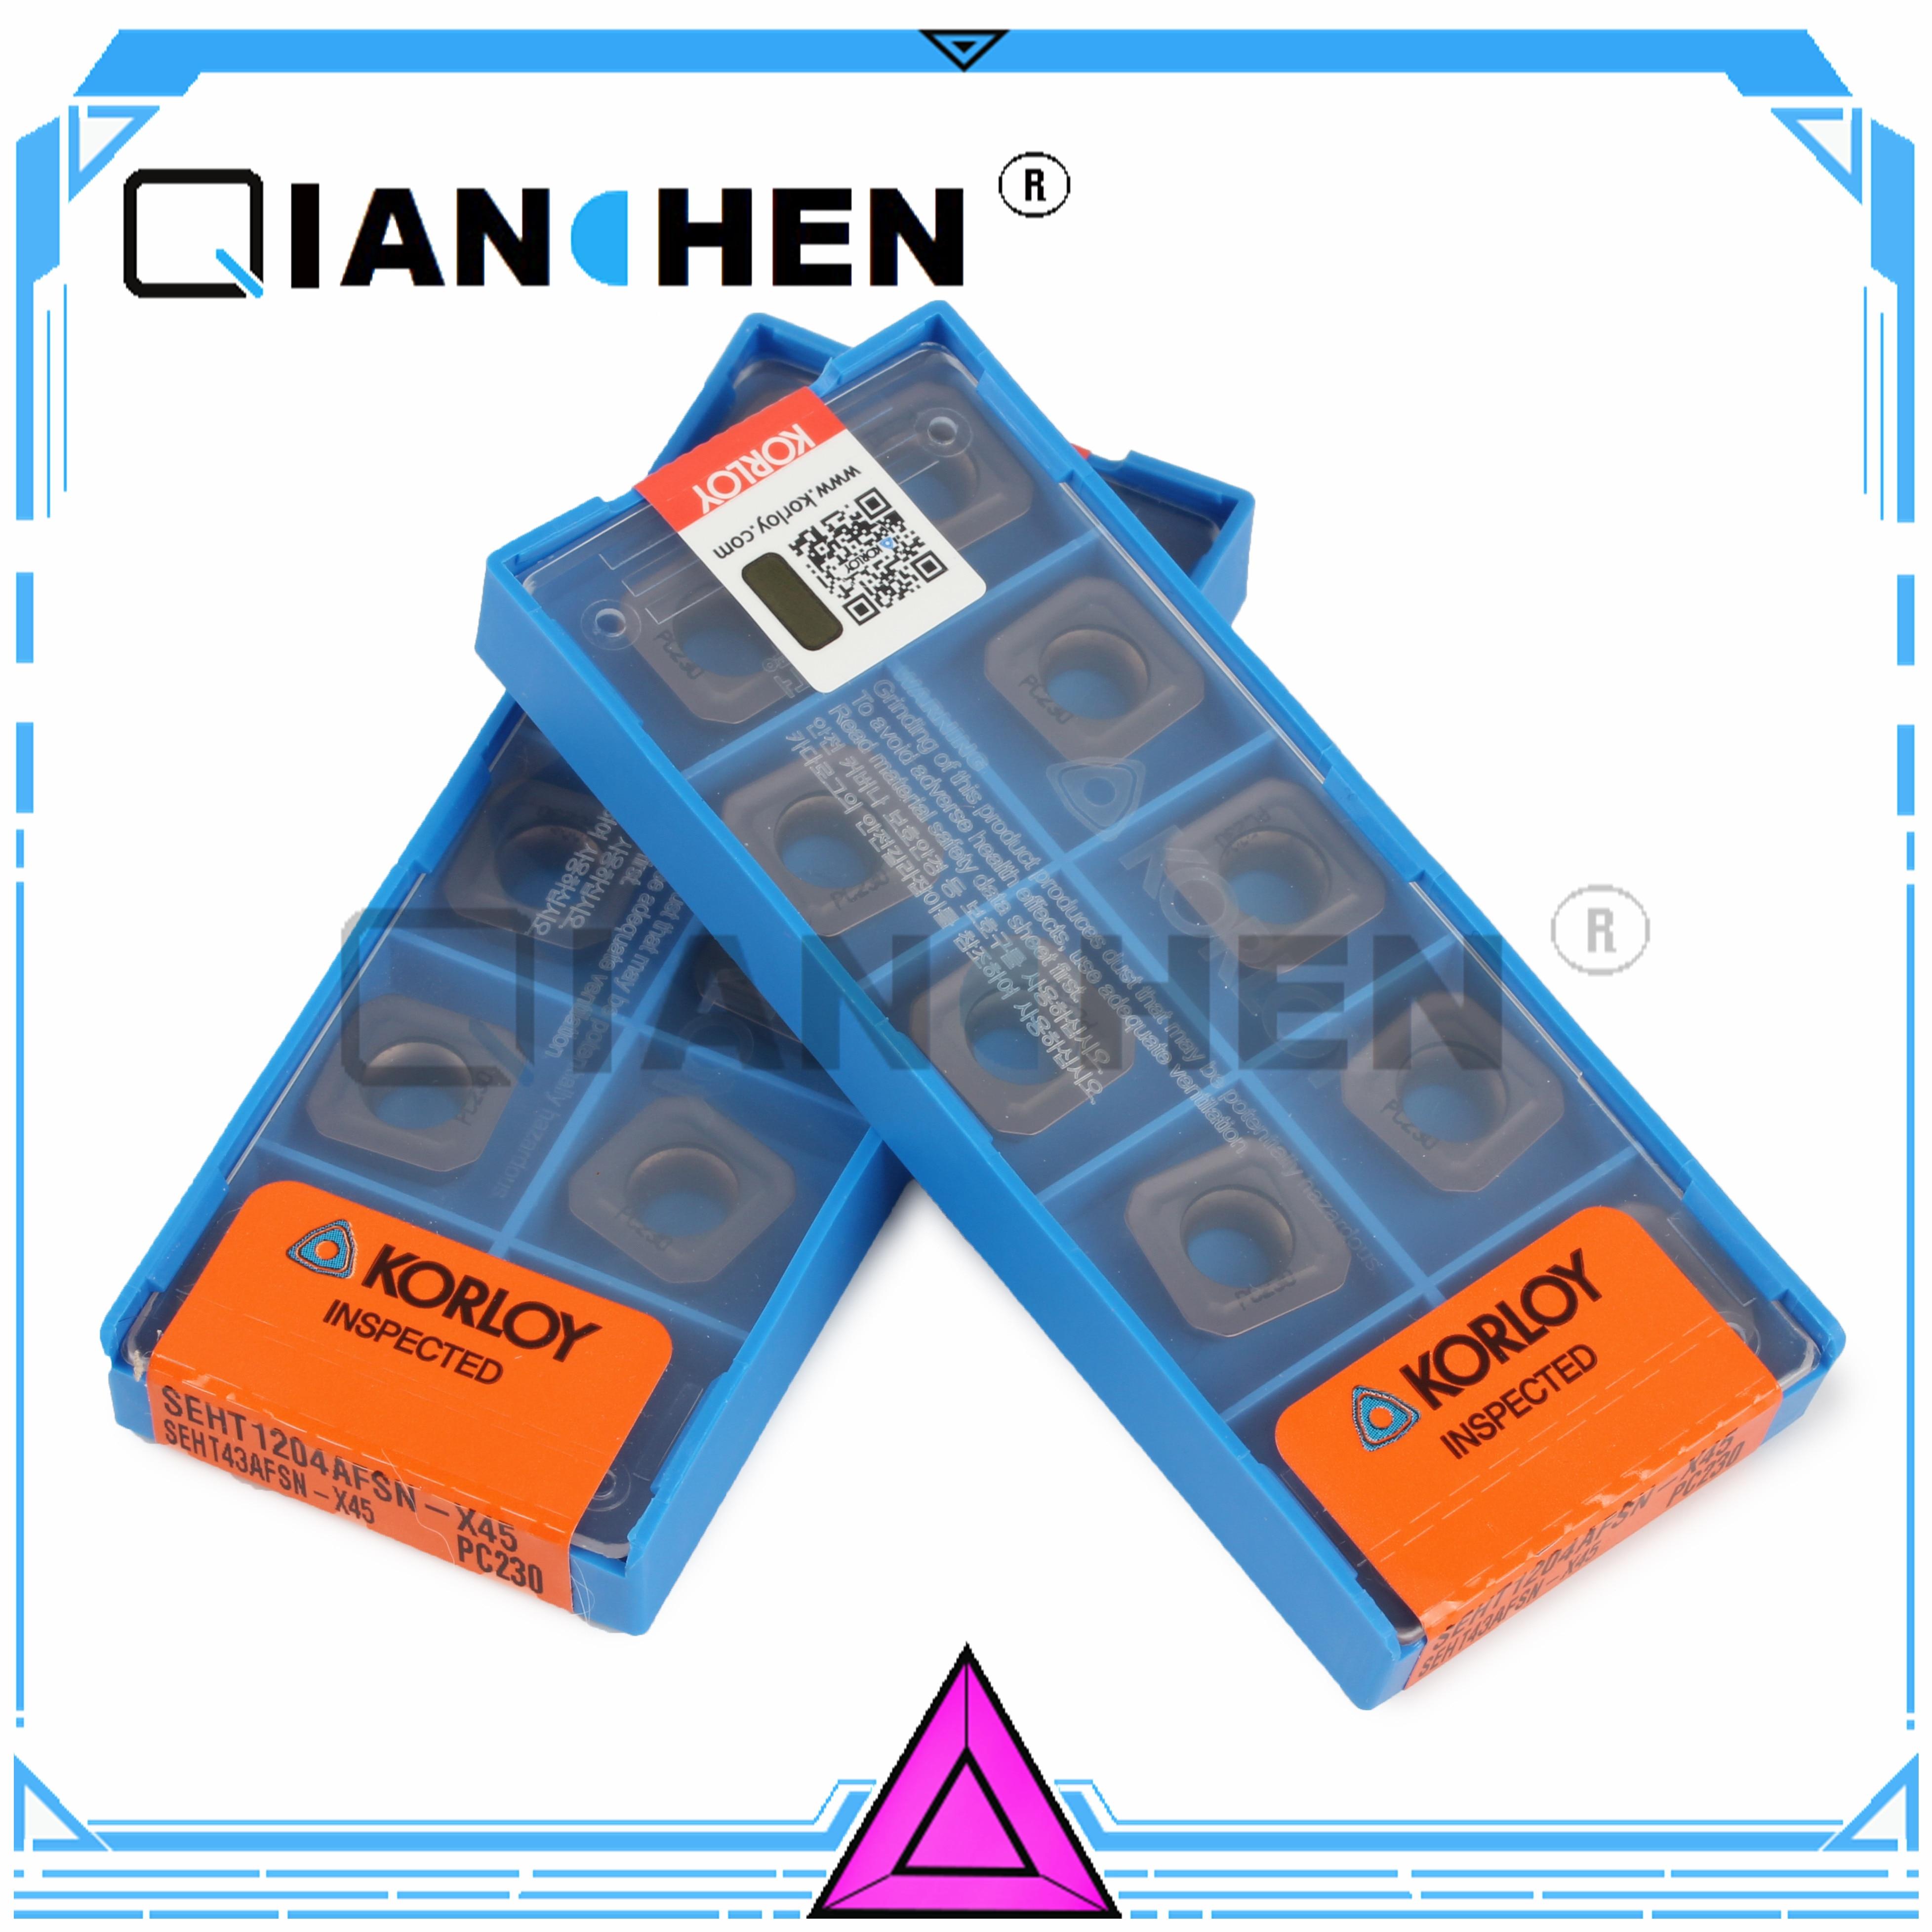 SEHT1204AFSN-X45 dorigine KORLOY PC230 (10 pcs/lot)SEHT1204AFSN-X45 dorigine KORLOY PC230 (10 pcs/lot)